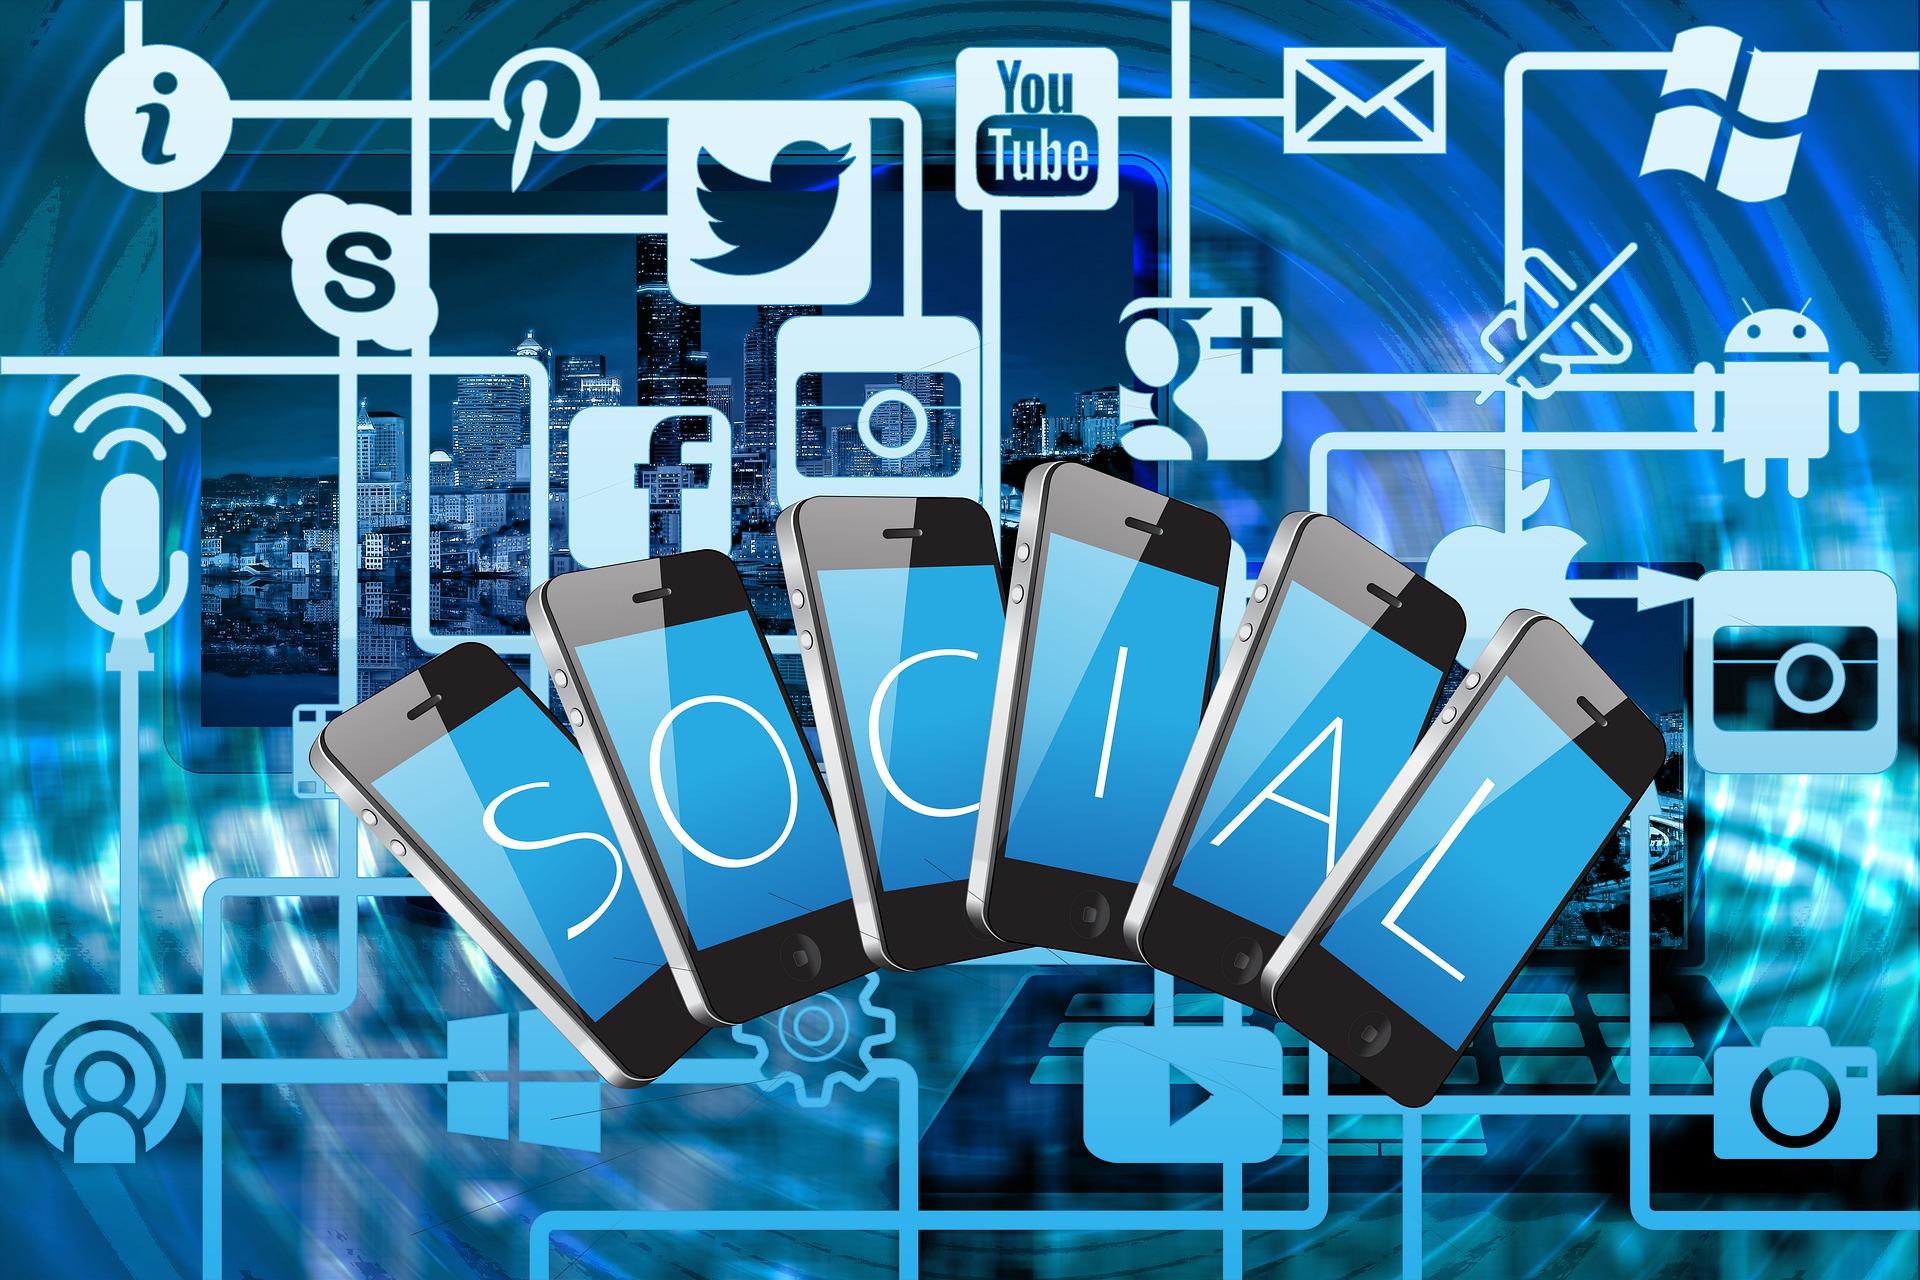 Social Media Netzwerk und Handys